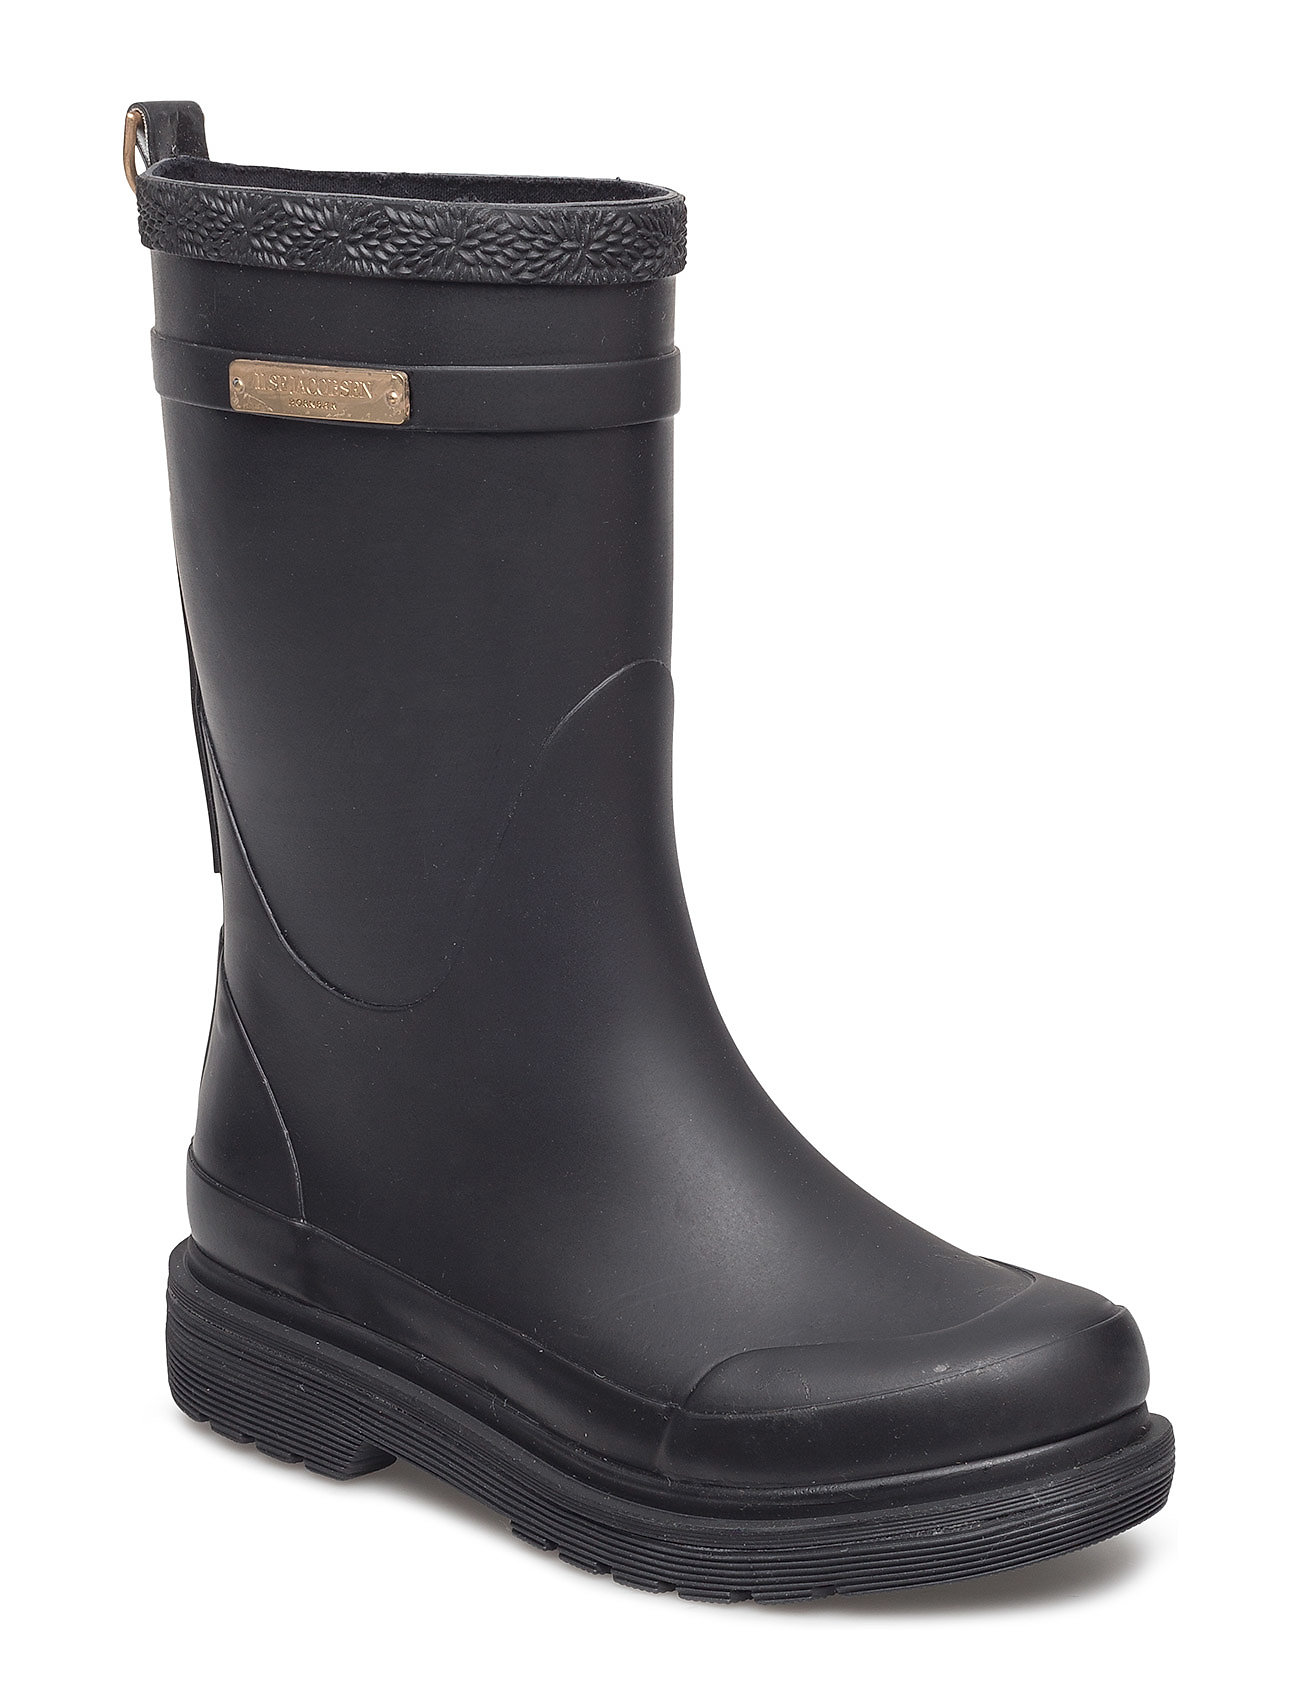 8142d5855abc Ilse Jacobsen gummistøvler – Rubber Boots til dame i Camouflage ...